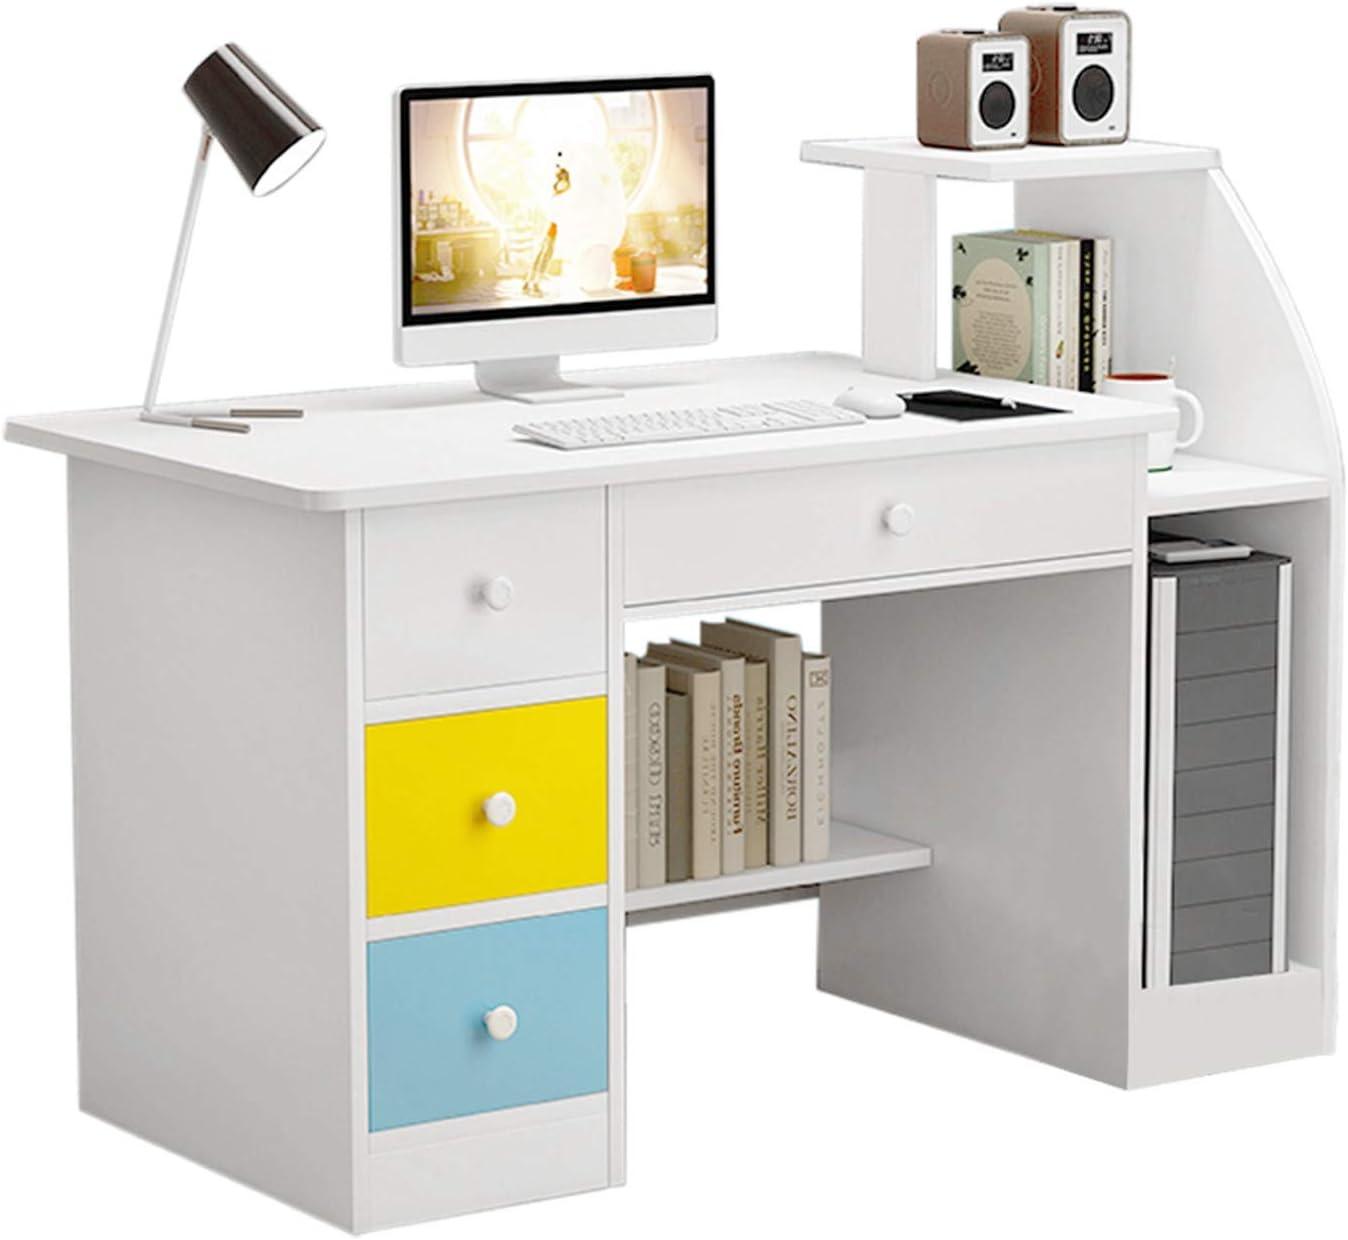 XIANGMIHU Small Wood Computer Desk Writer Student De Popular product Ranking TOP16 White Desks